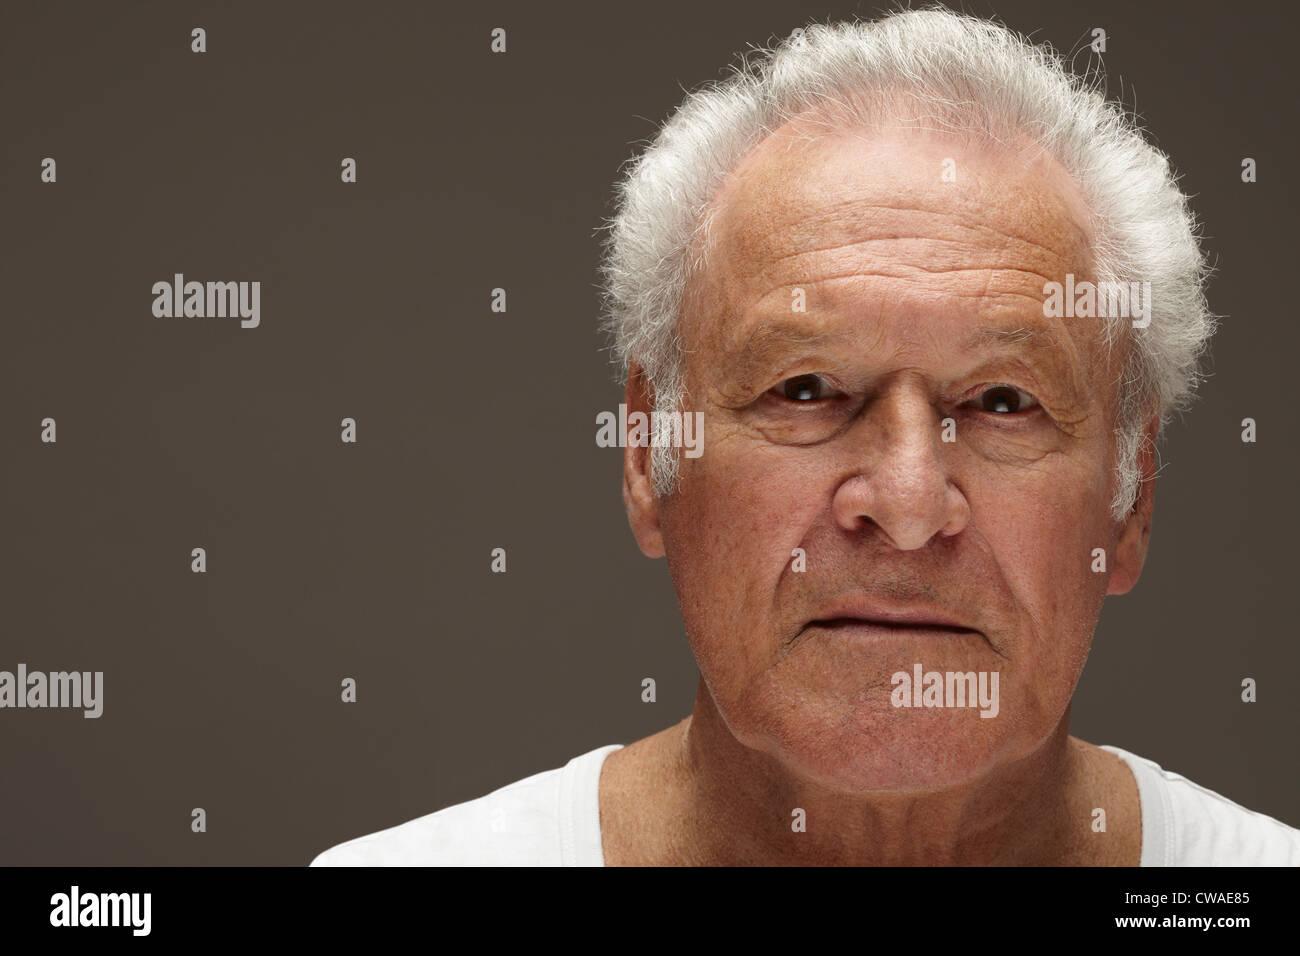 Contemplative senior man, portrait - Stock Image